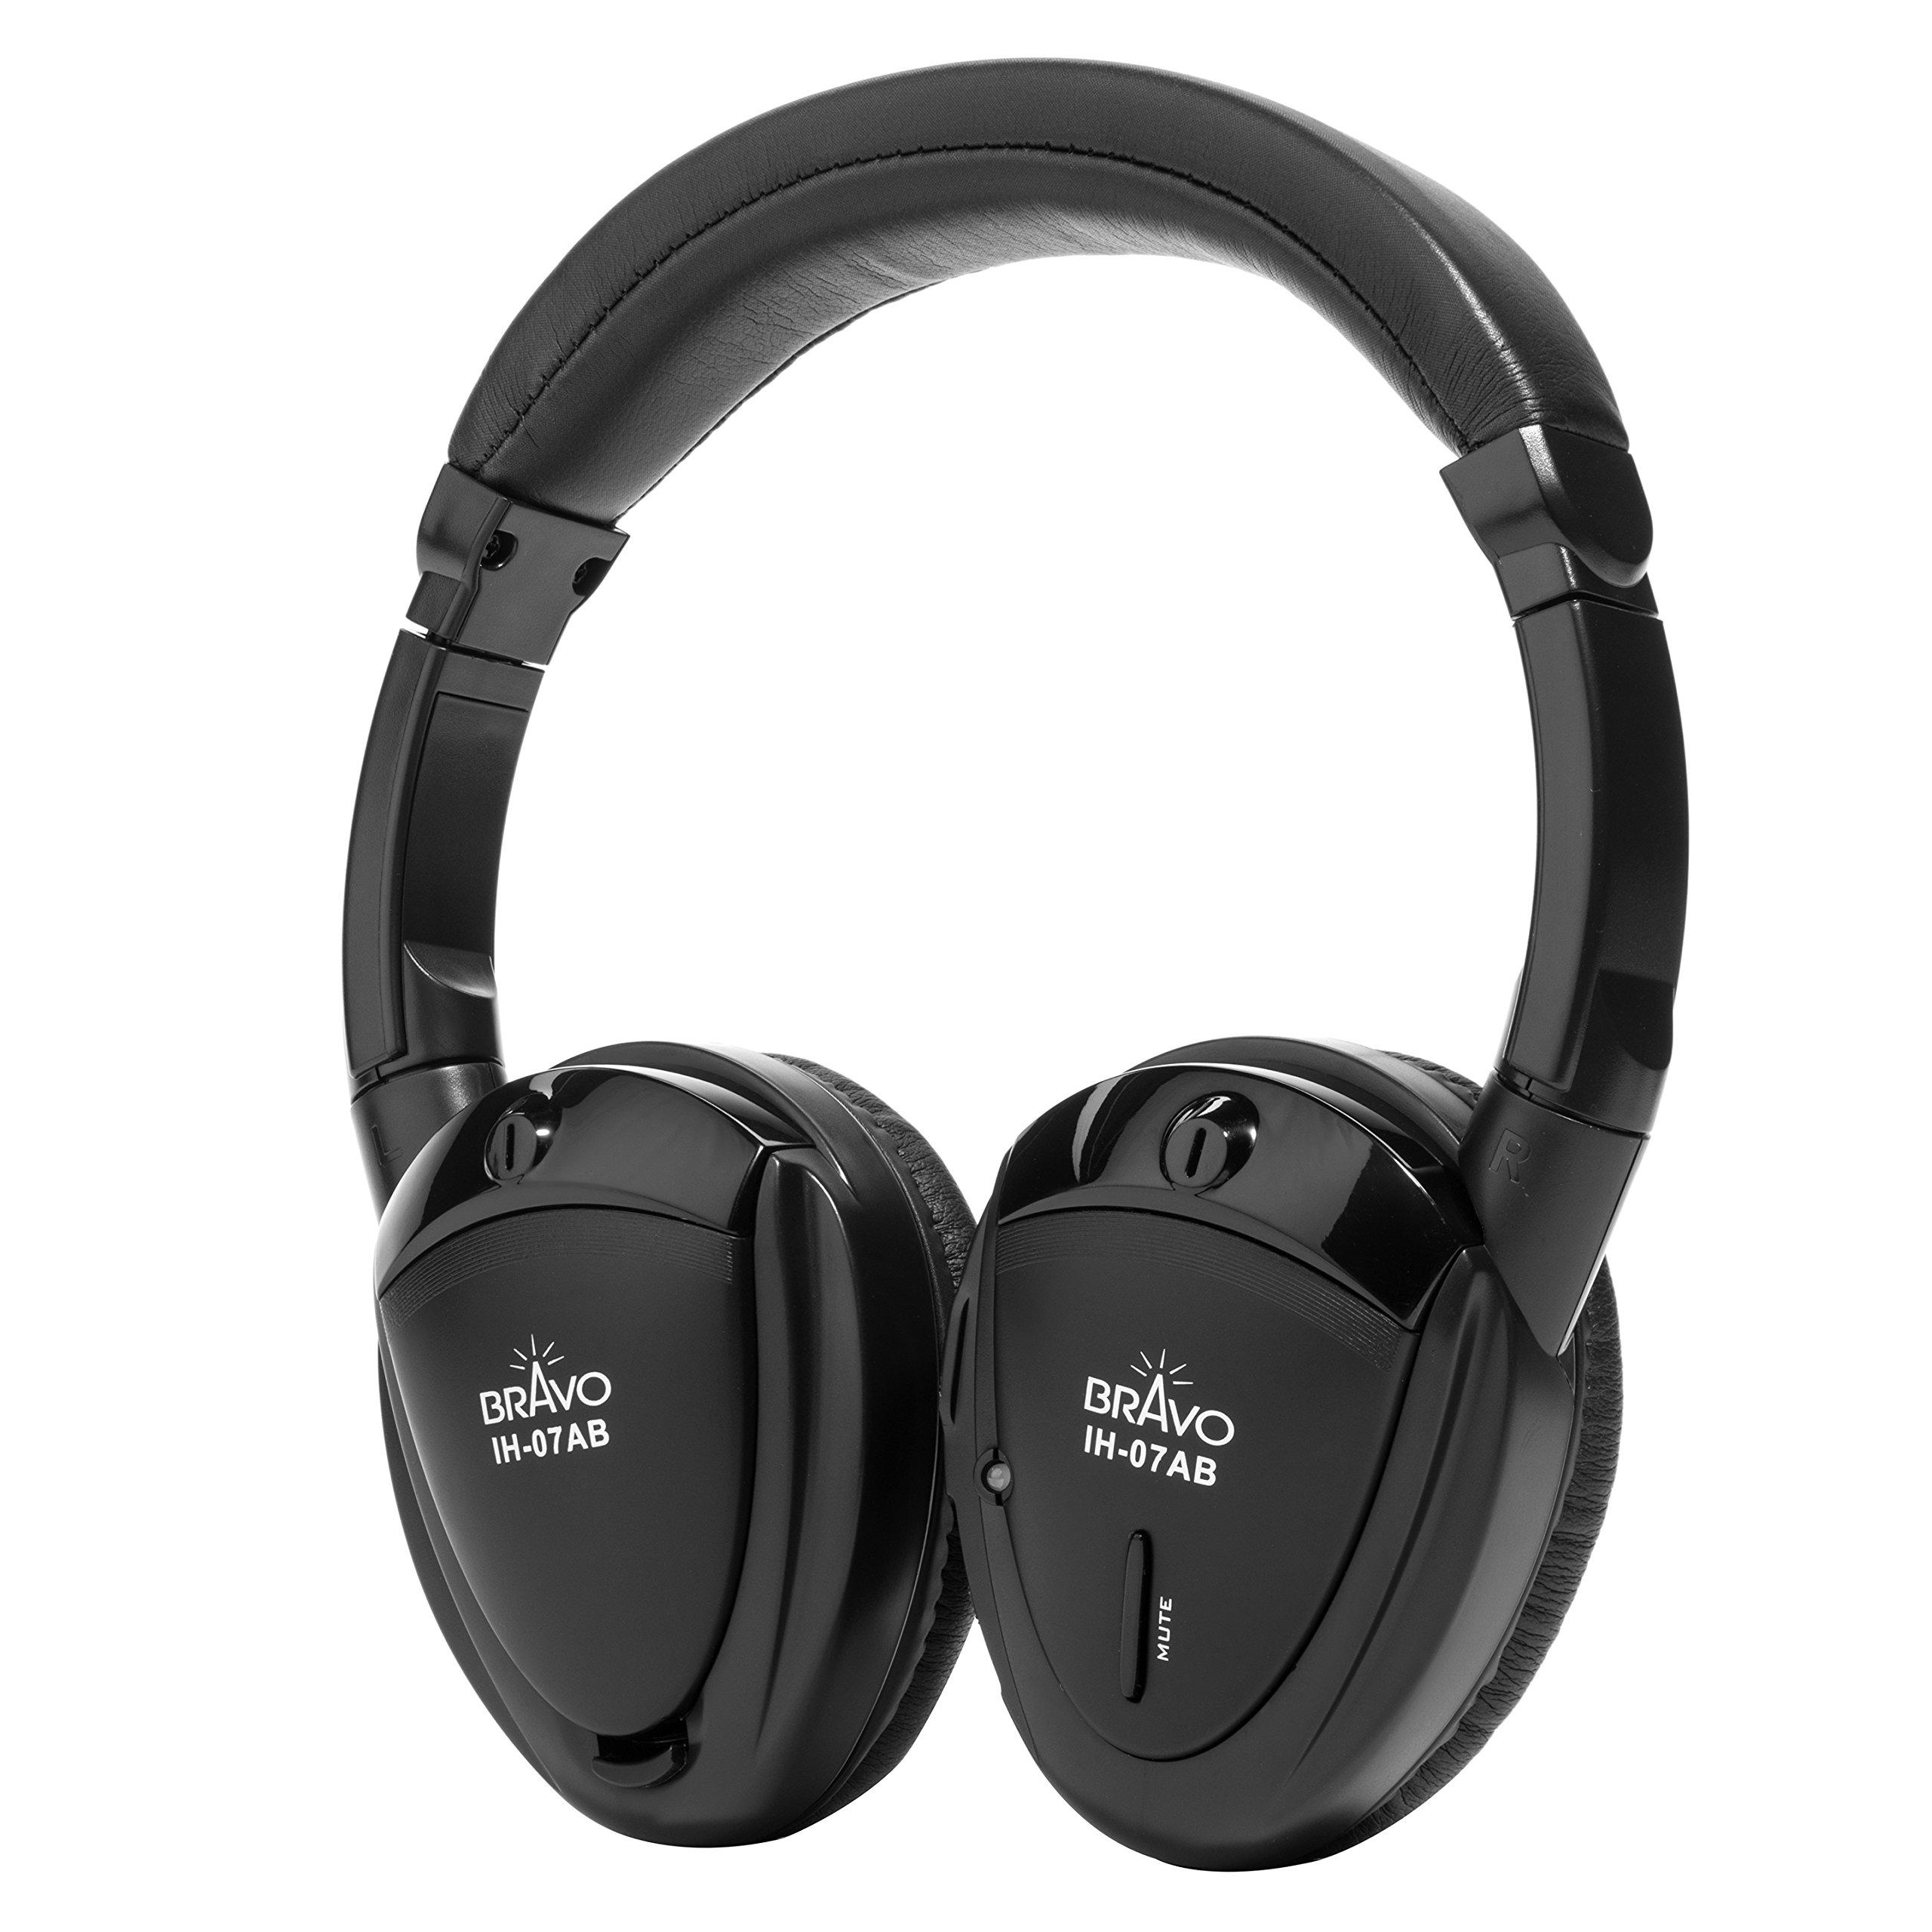 Bravo View IH-07AB - Dual-Source Automotive IR Wireless Headphones